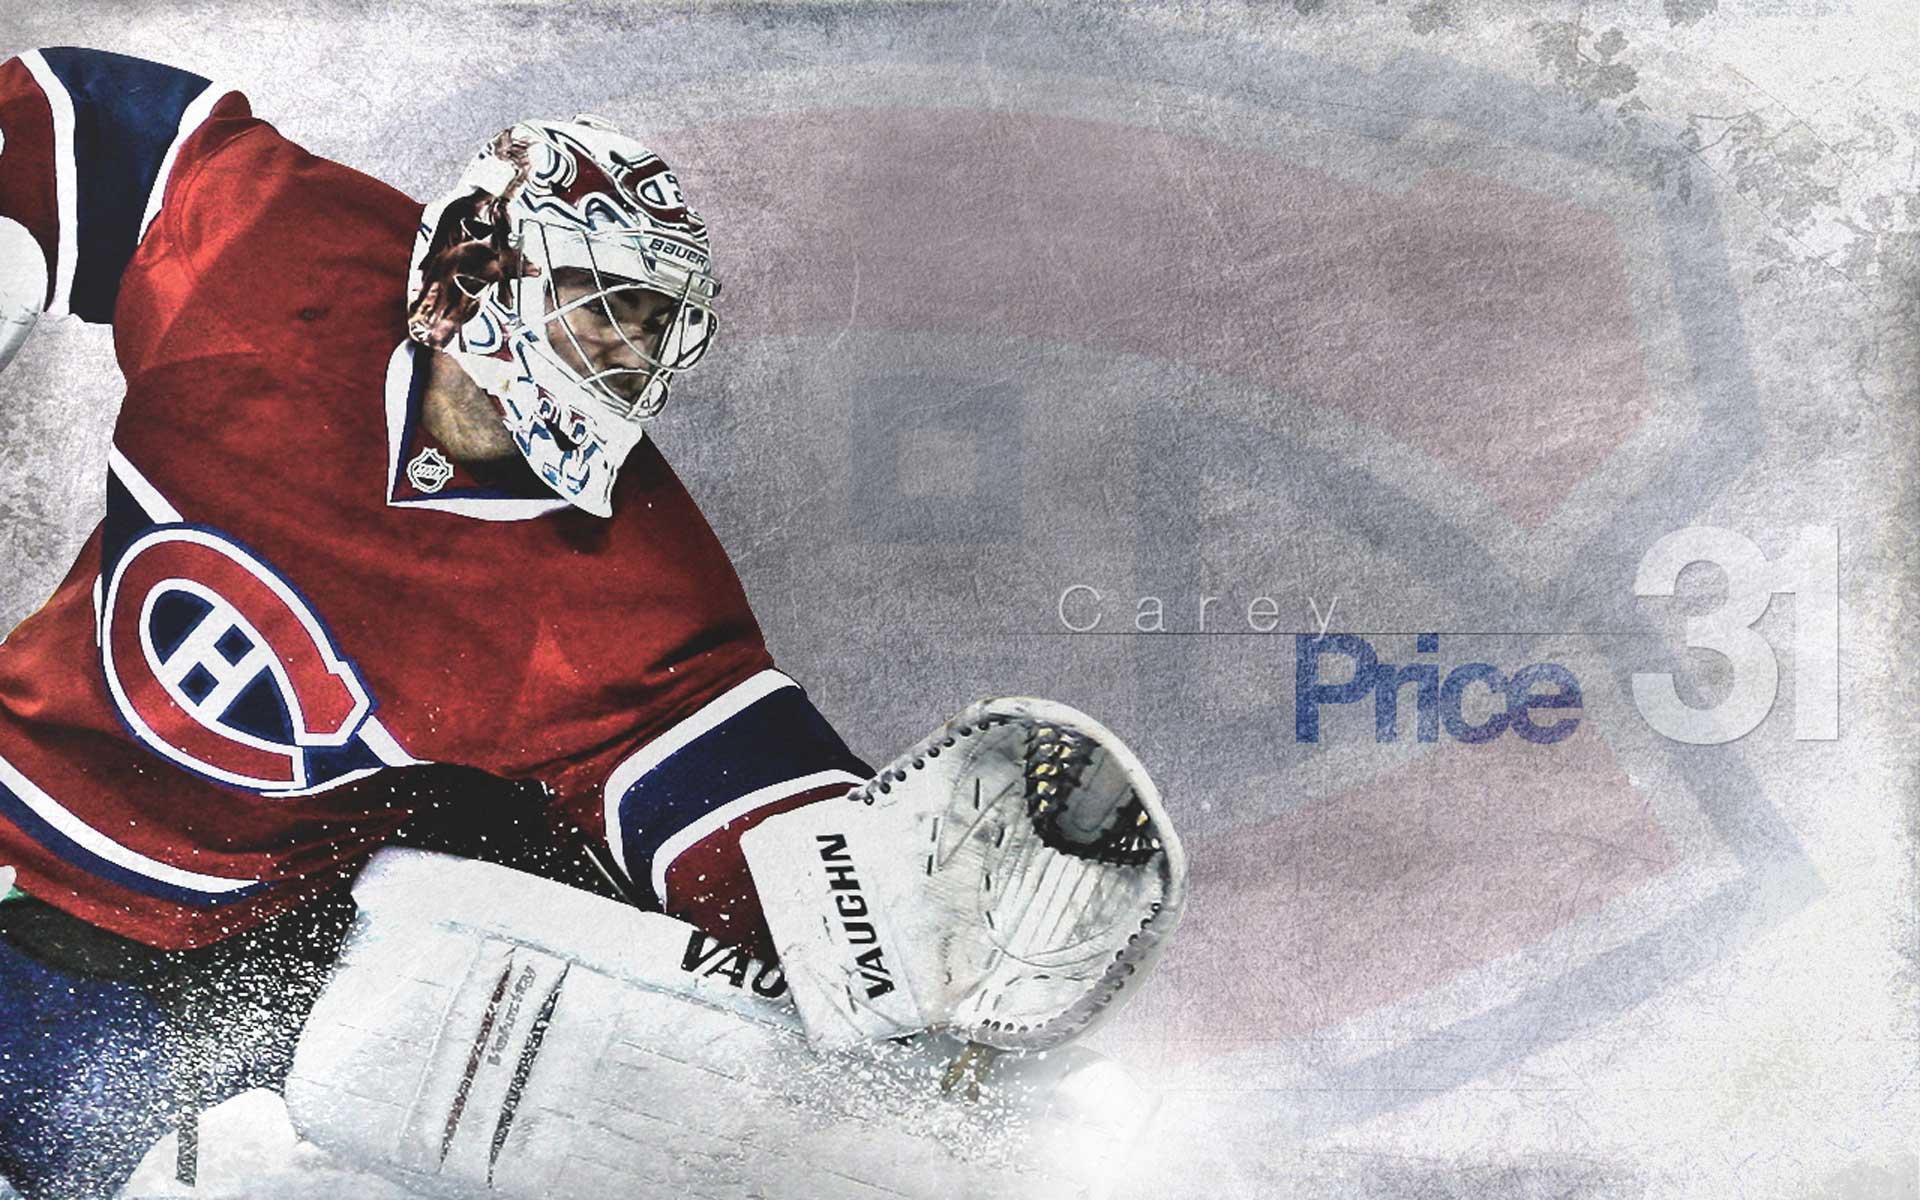 Hockey Carey Price Montreal Canadiens wallpaper 1920x1200 128658 1920x1200